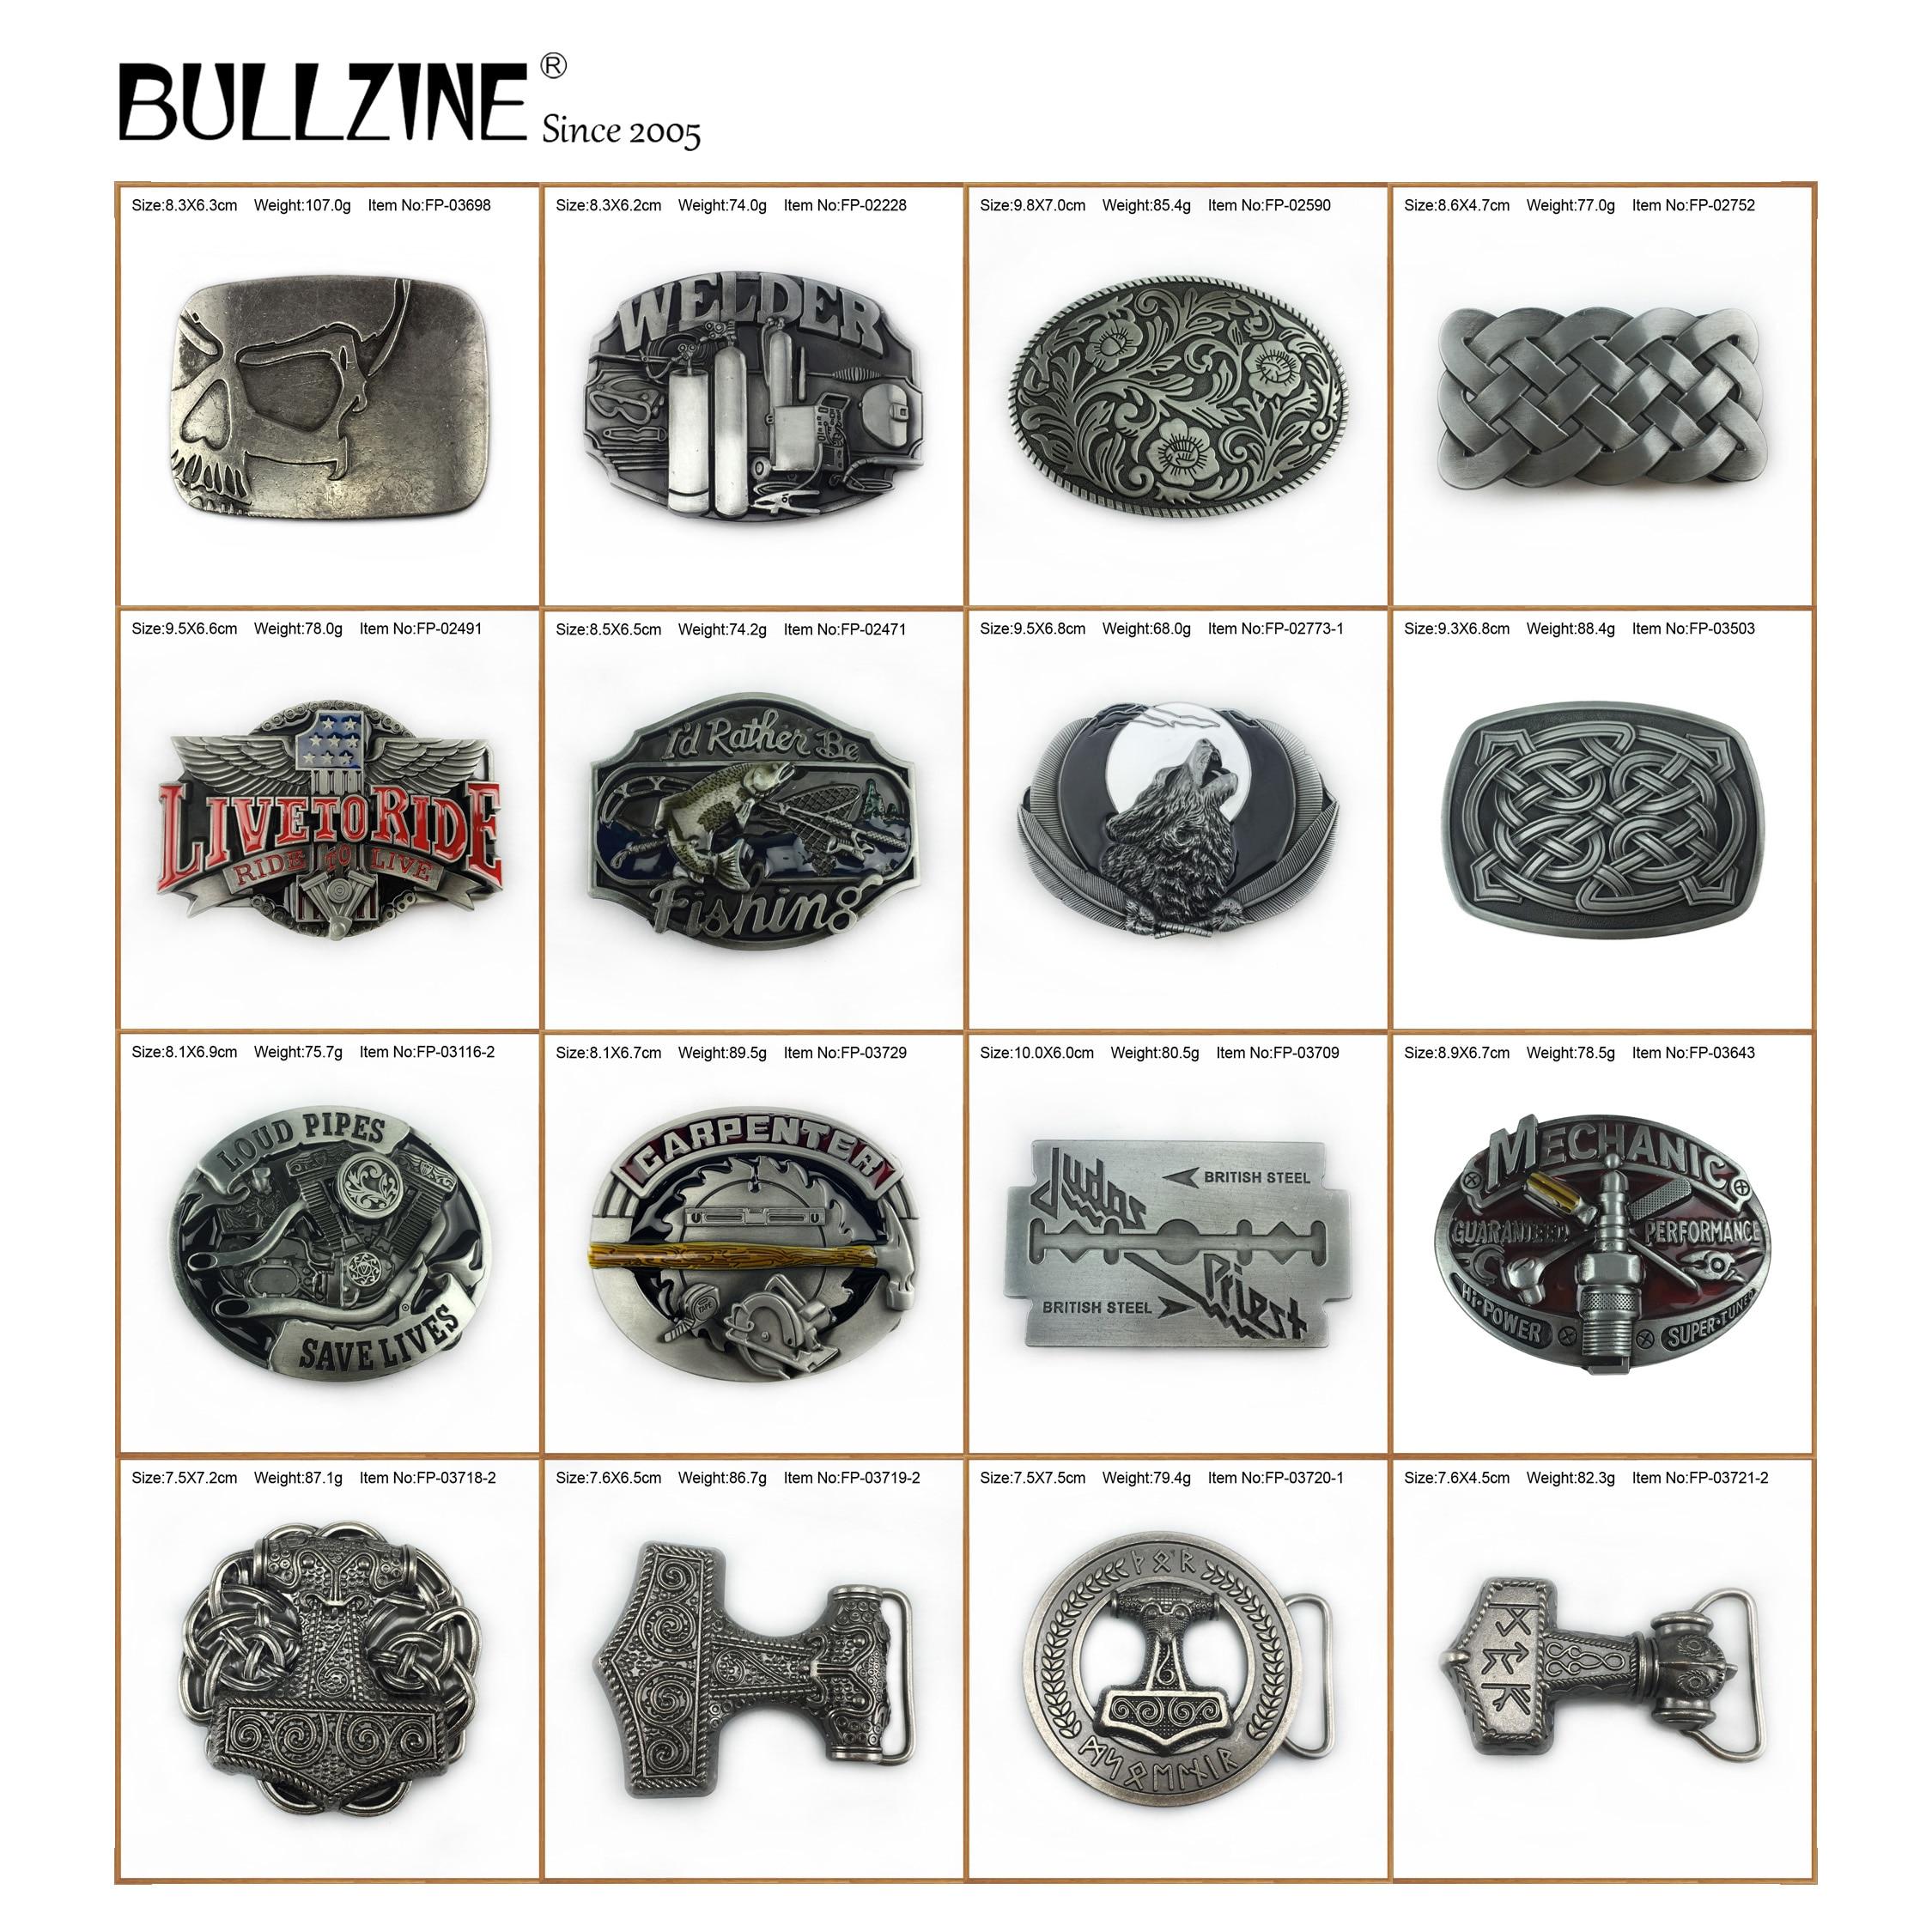 Bullzine Zinc Alloy Mjolnir THORSHAMMER VIKING JUDAS Skull Belt Buckle Welder Wolf CARPENTER MECHANIC Celtic Fishing Belt Buckle